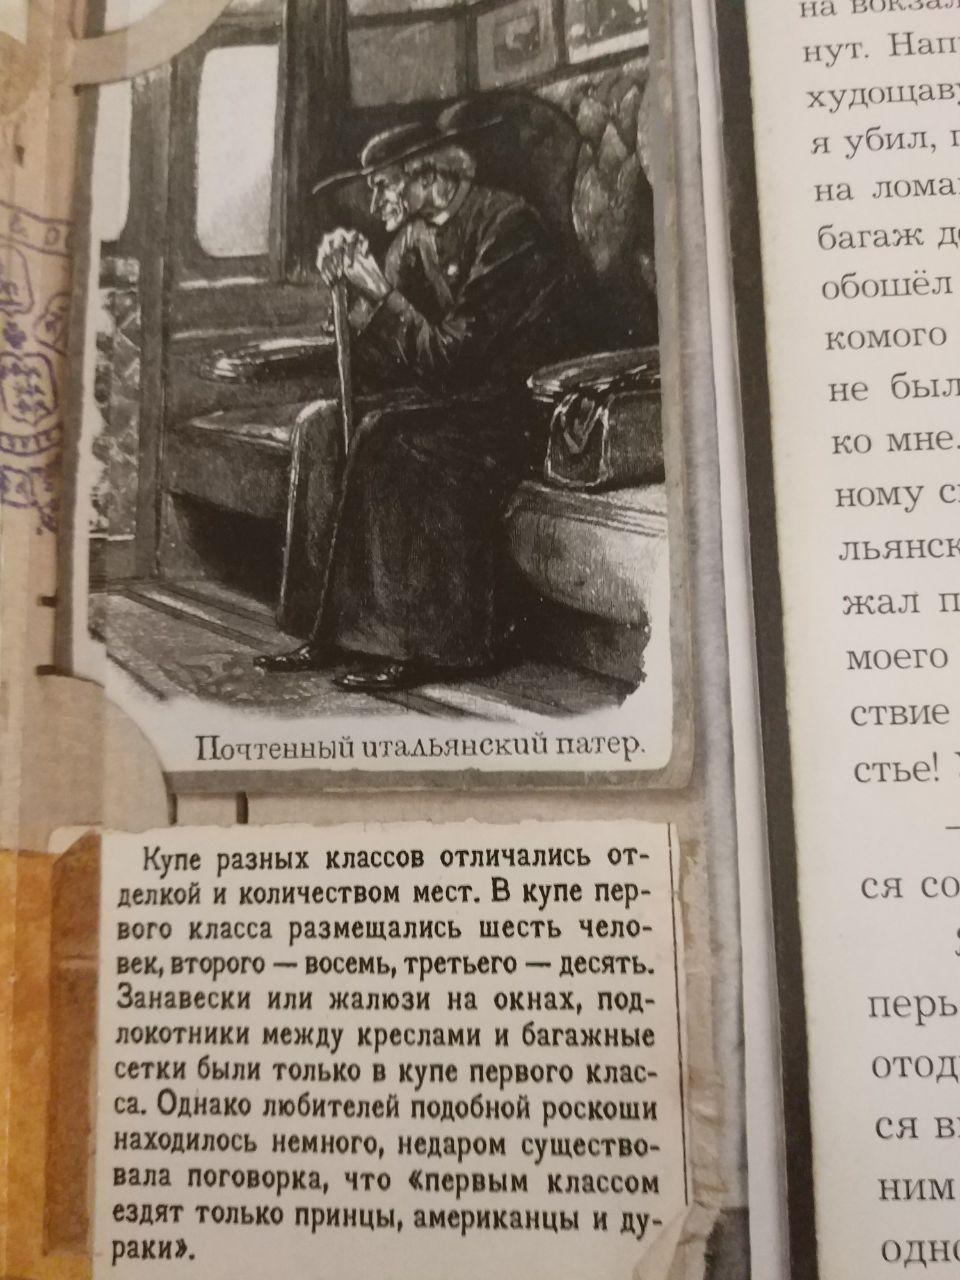 http://s7.uploads.ru/PpVwS.jpg